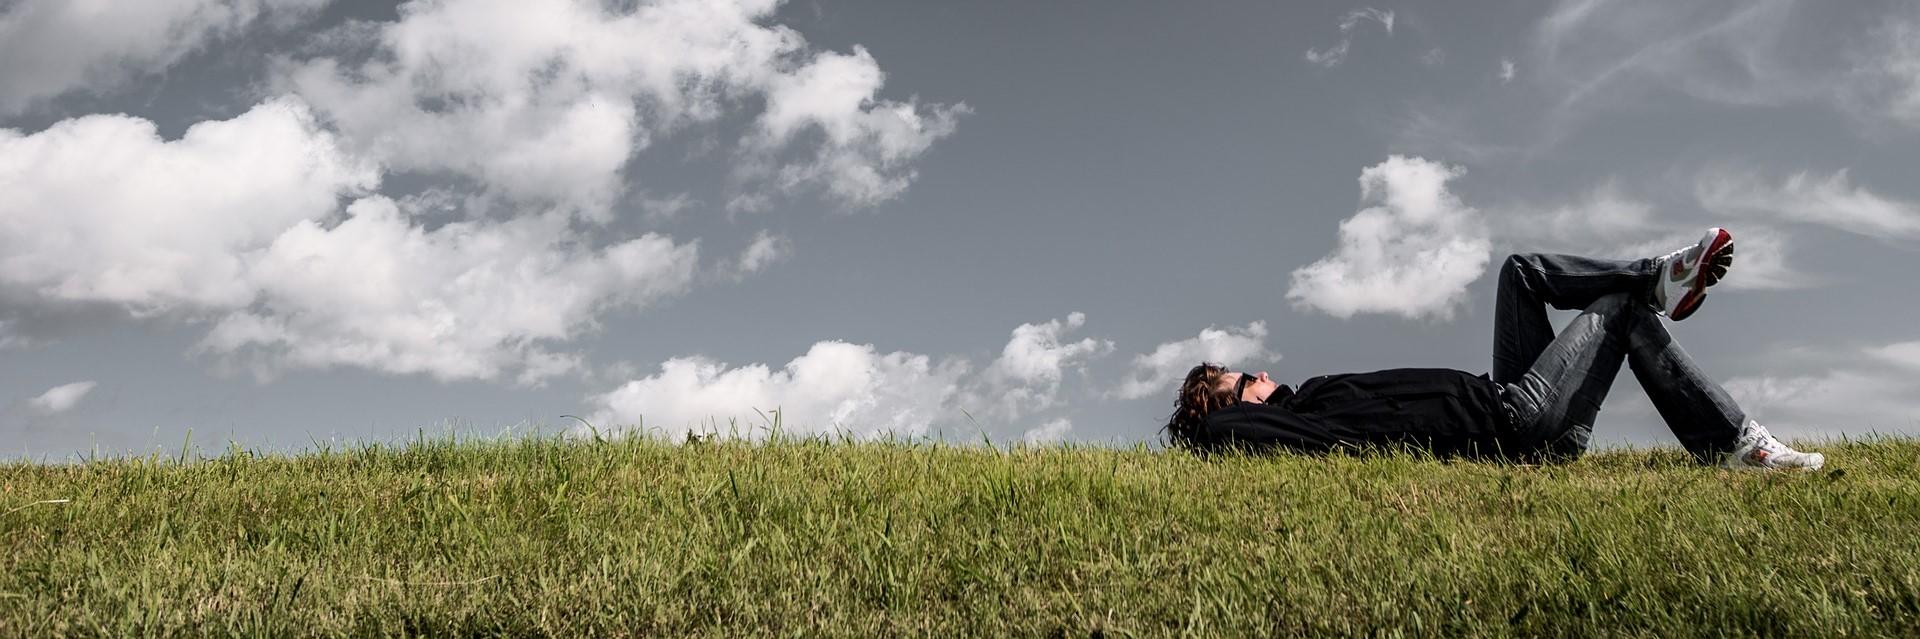 R.E.S.E.T.® Basiskurs - Entspannter Kiefer, entspannter Körper